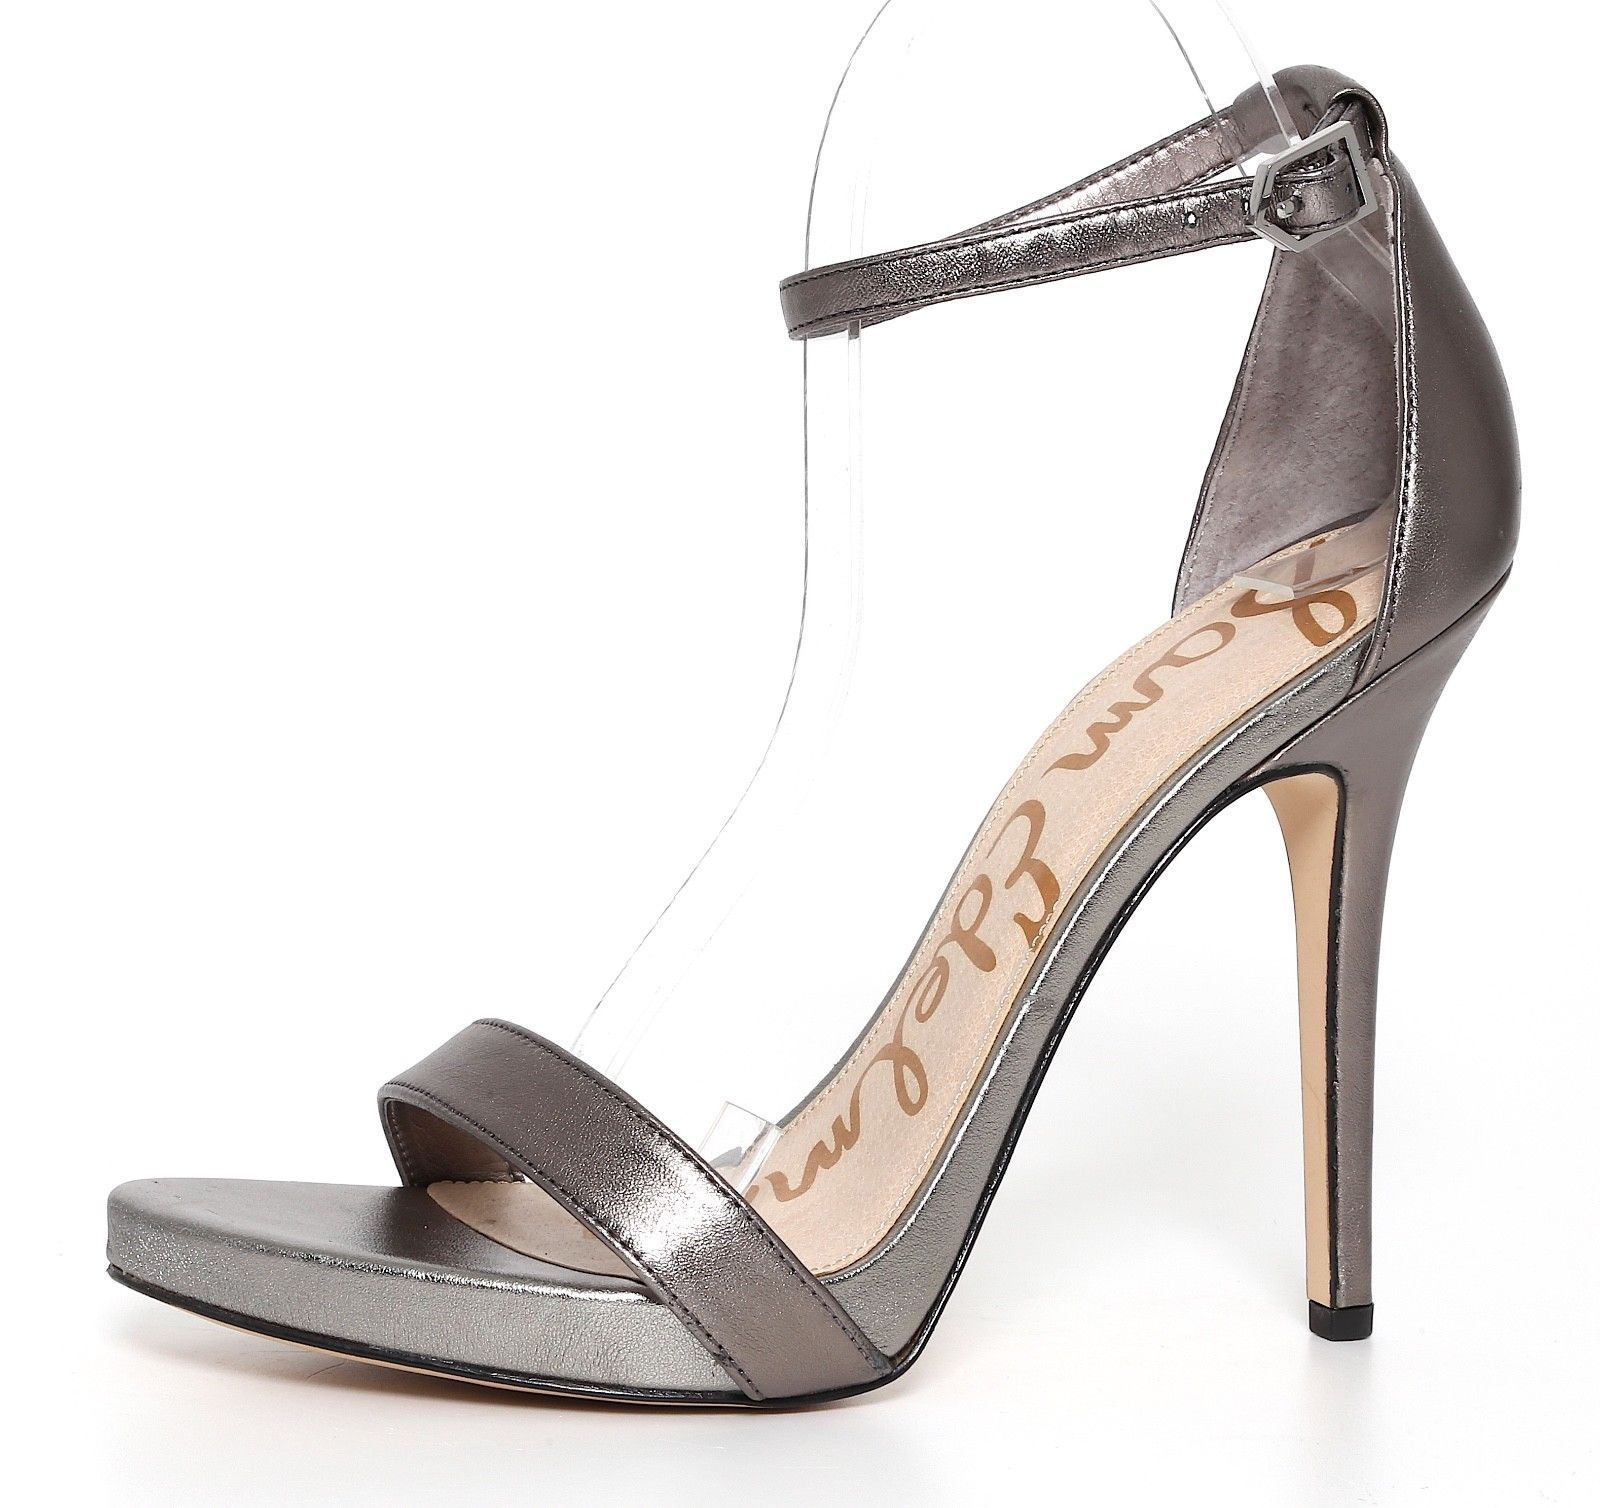 333f8f8541a 94.60 | Sam Edelman Eleanor Leather Ankle Strap Sandal Silver Women ...